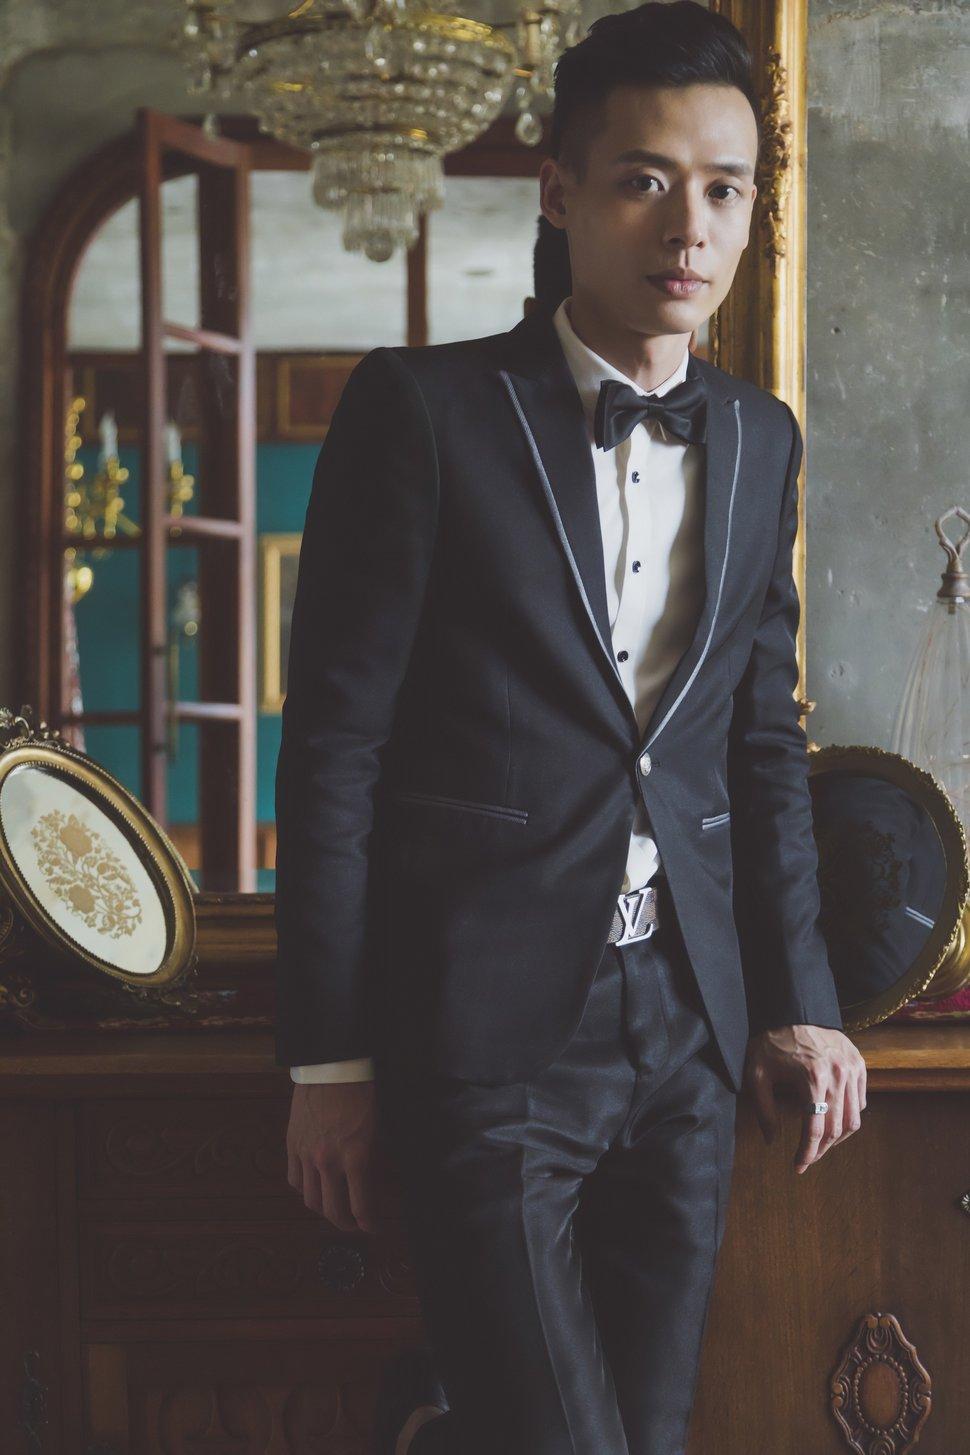 Khalil Chou(個性雜誌)-3 - Khalil Chou (凱勒·周)《結婚吧》